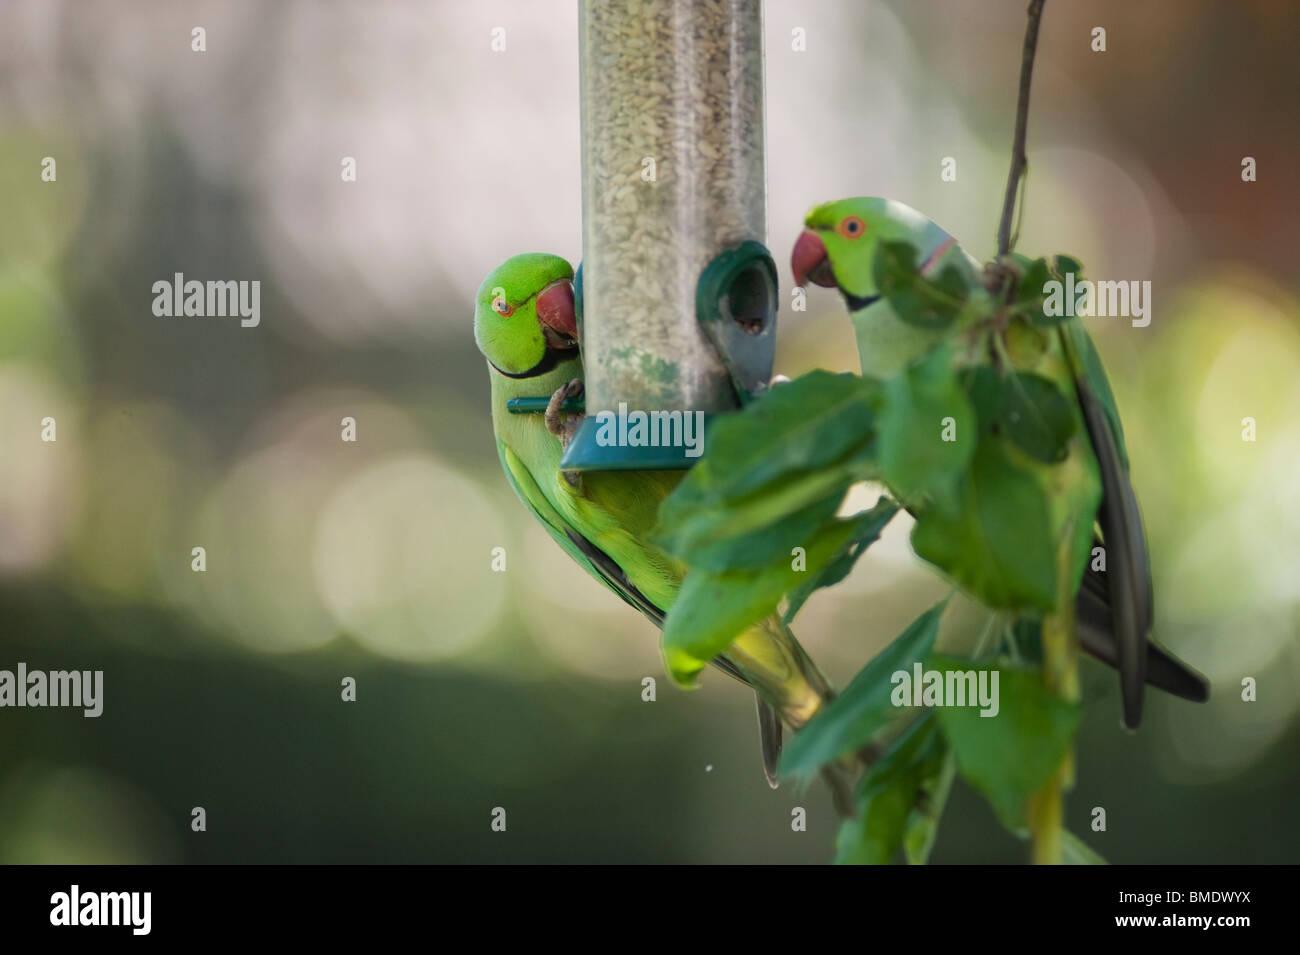 Wild Ring Necked Parakeets on nut feeder, London, England, UK Stock Photo